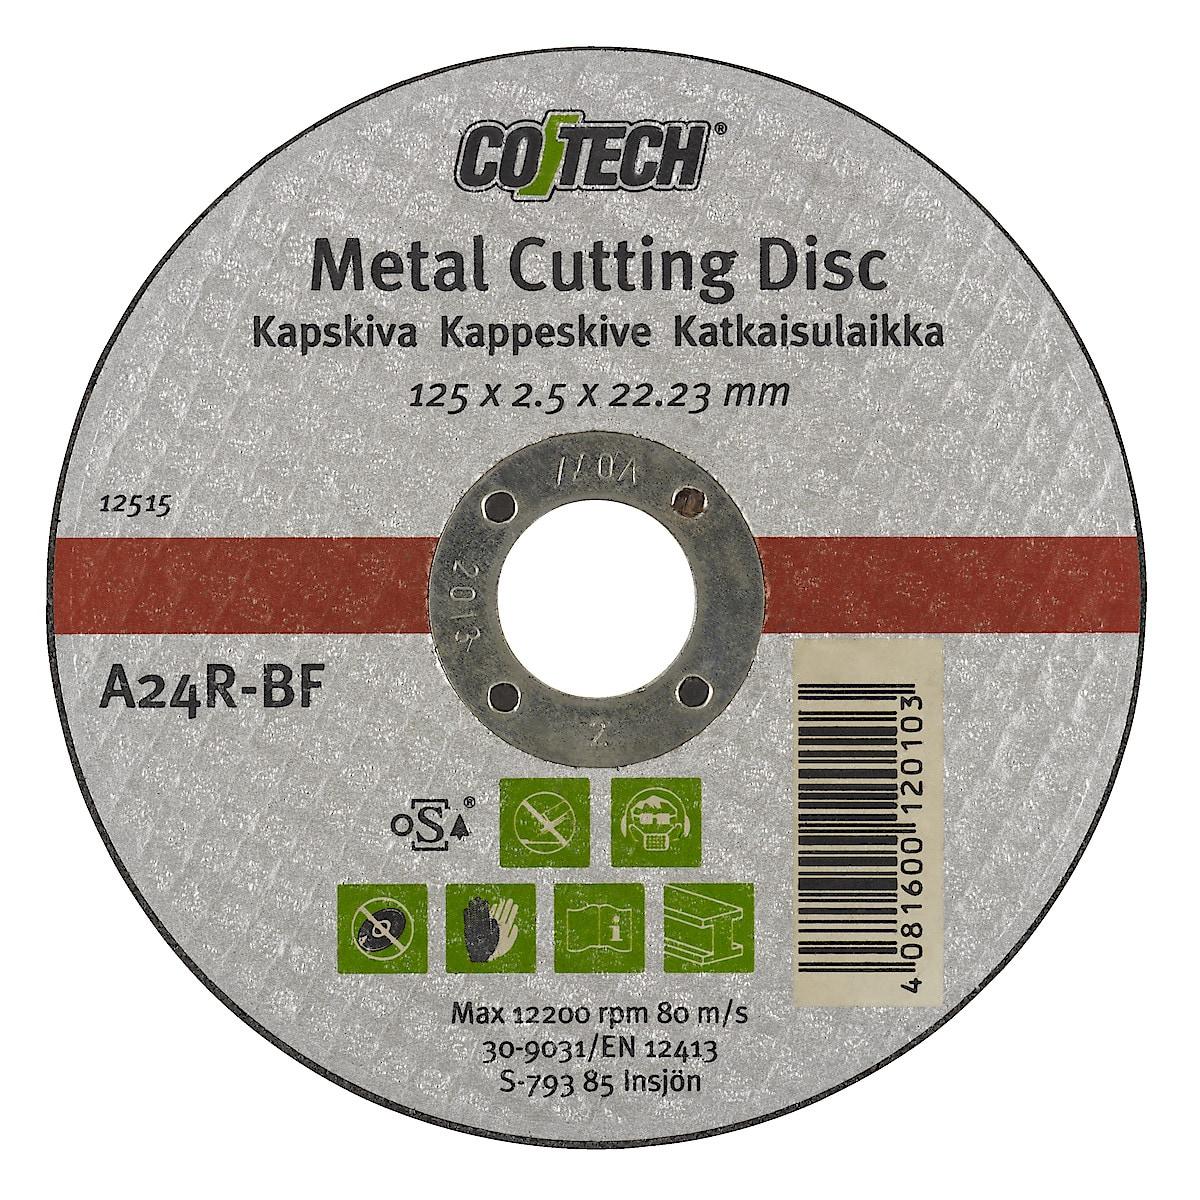 Cotech Metal Cutting Disc